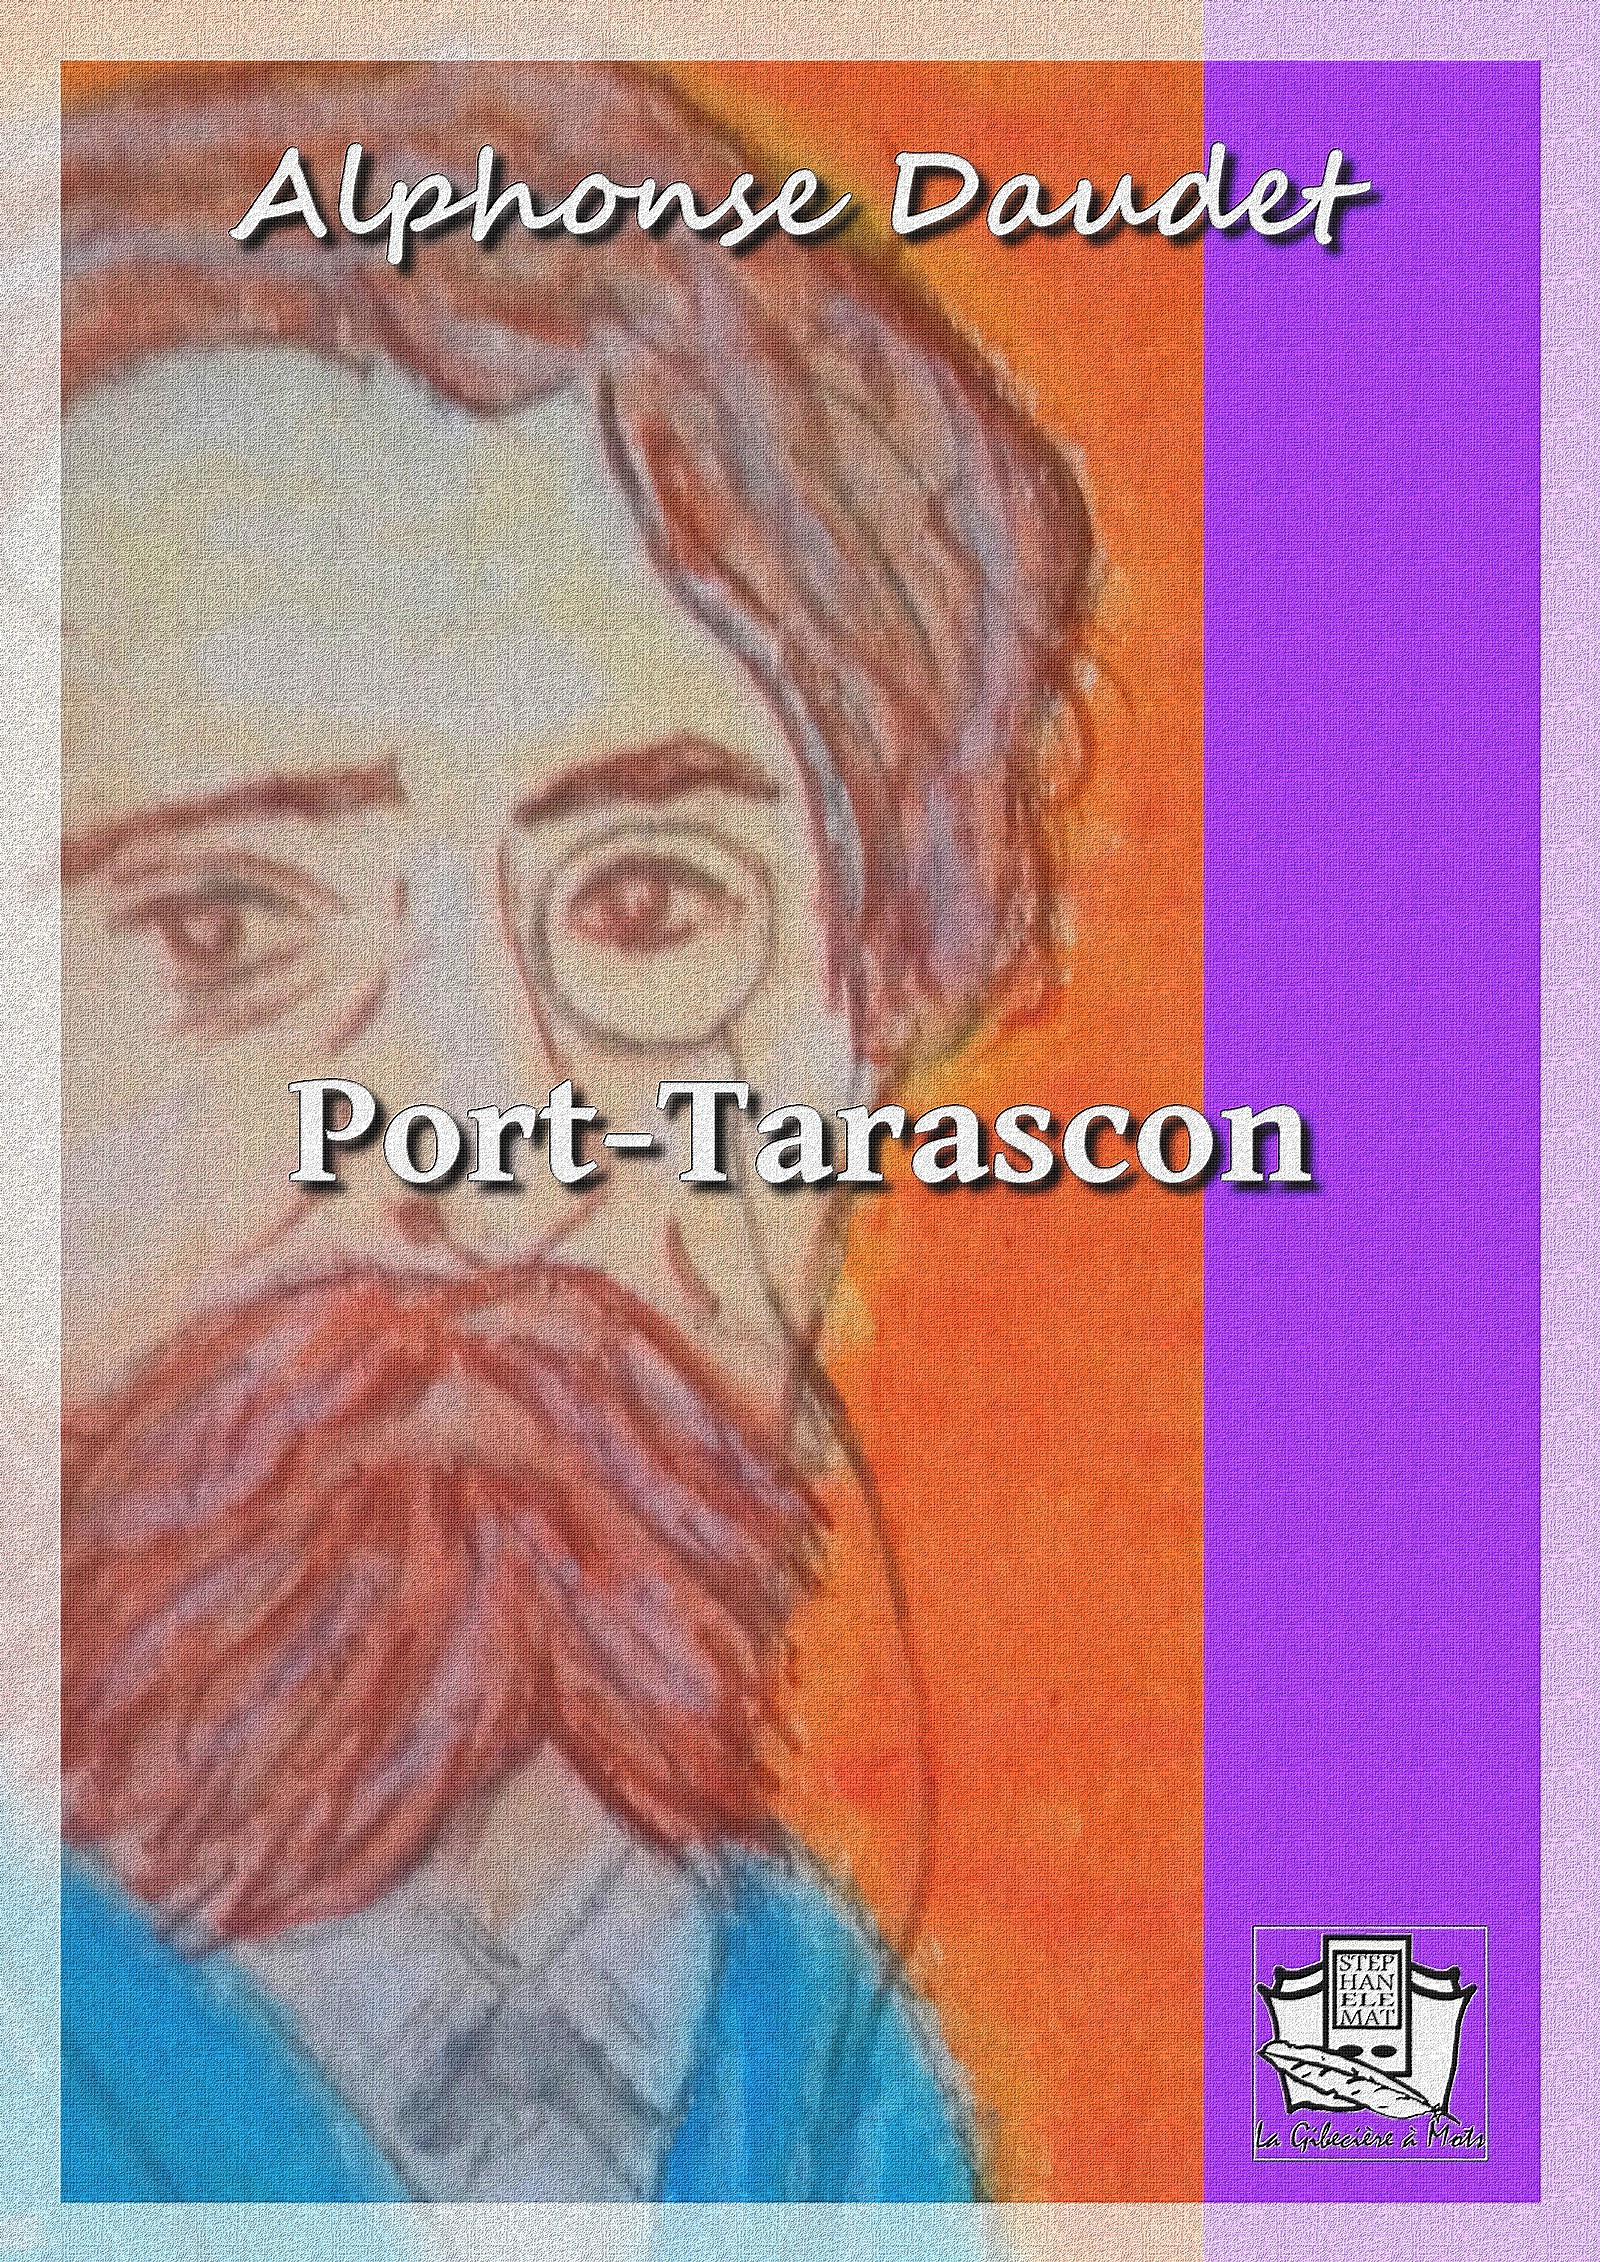 Port-Tarascon, DERNIÈRES AVENTURES DE L'ILLUSTRE TARTARIN